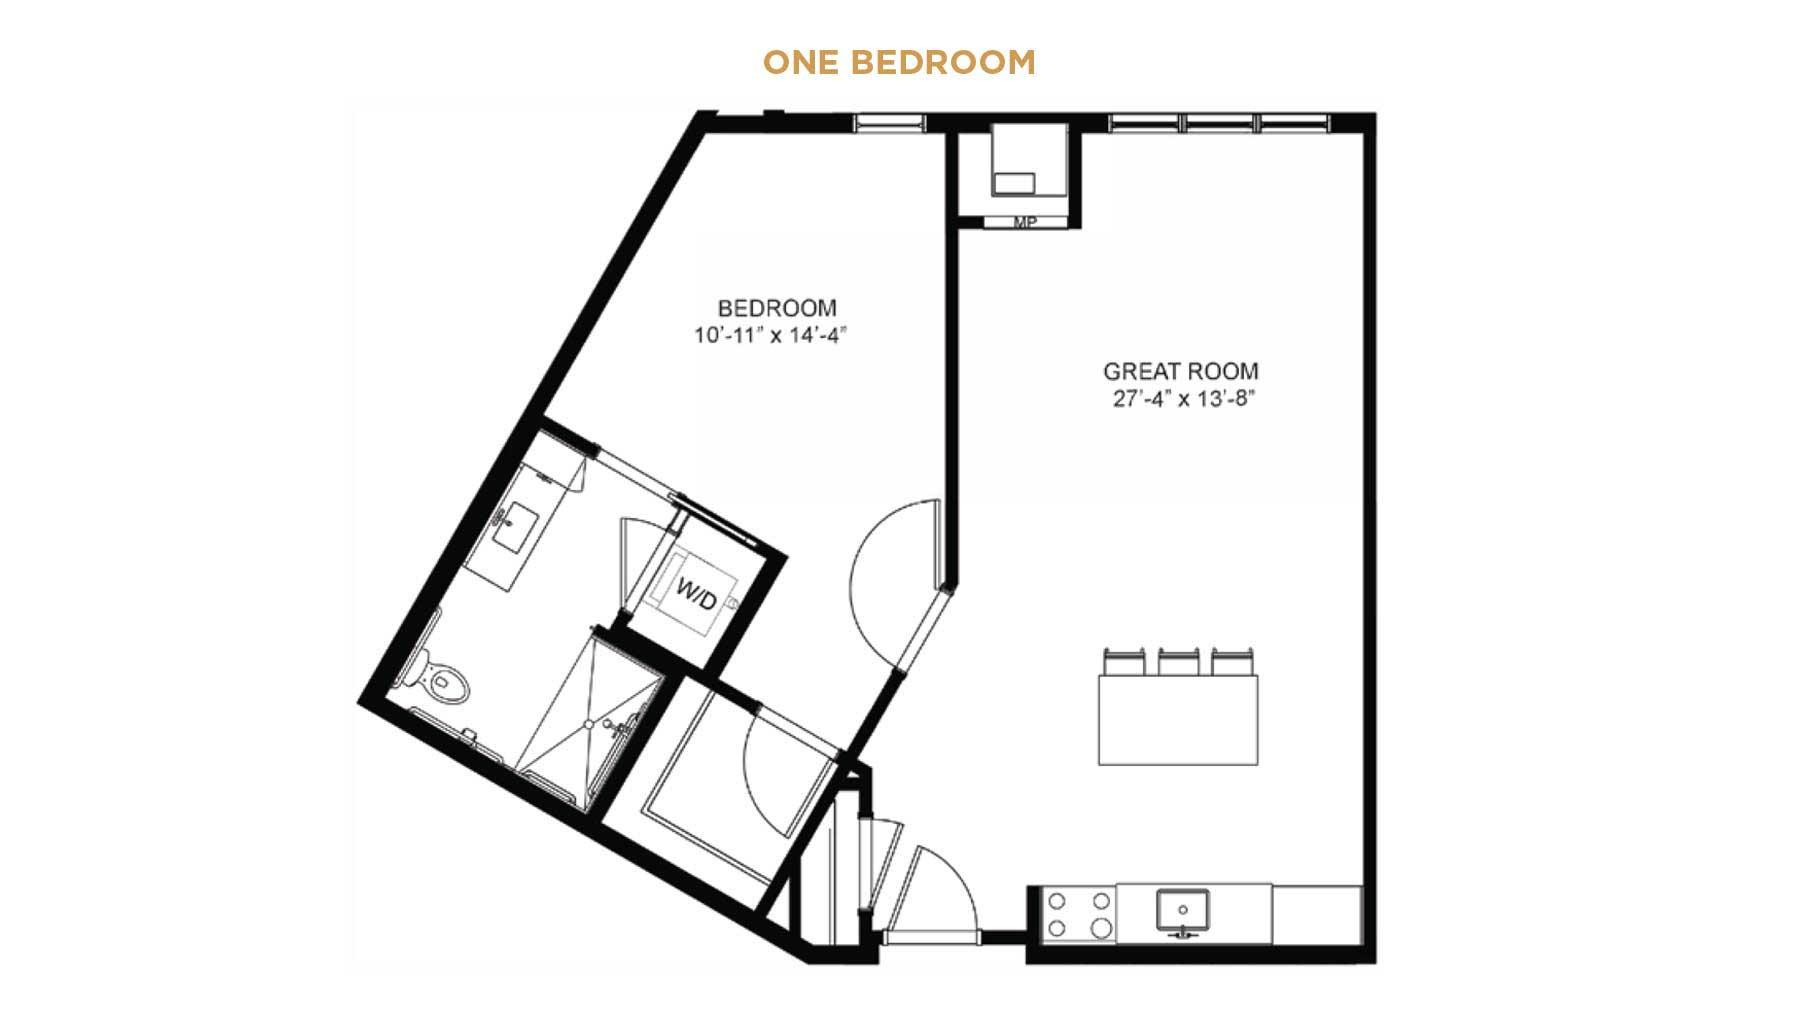 Senior Living one bedroom floor plan